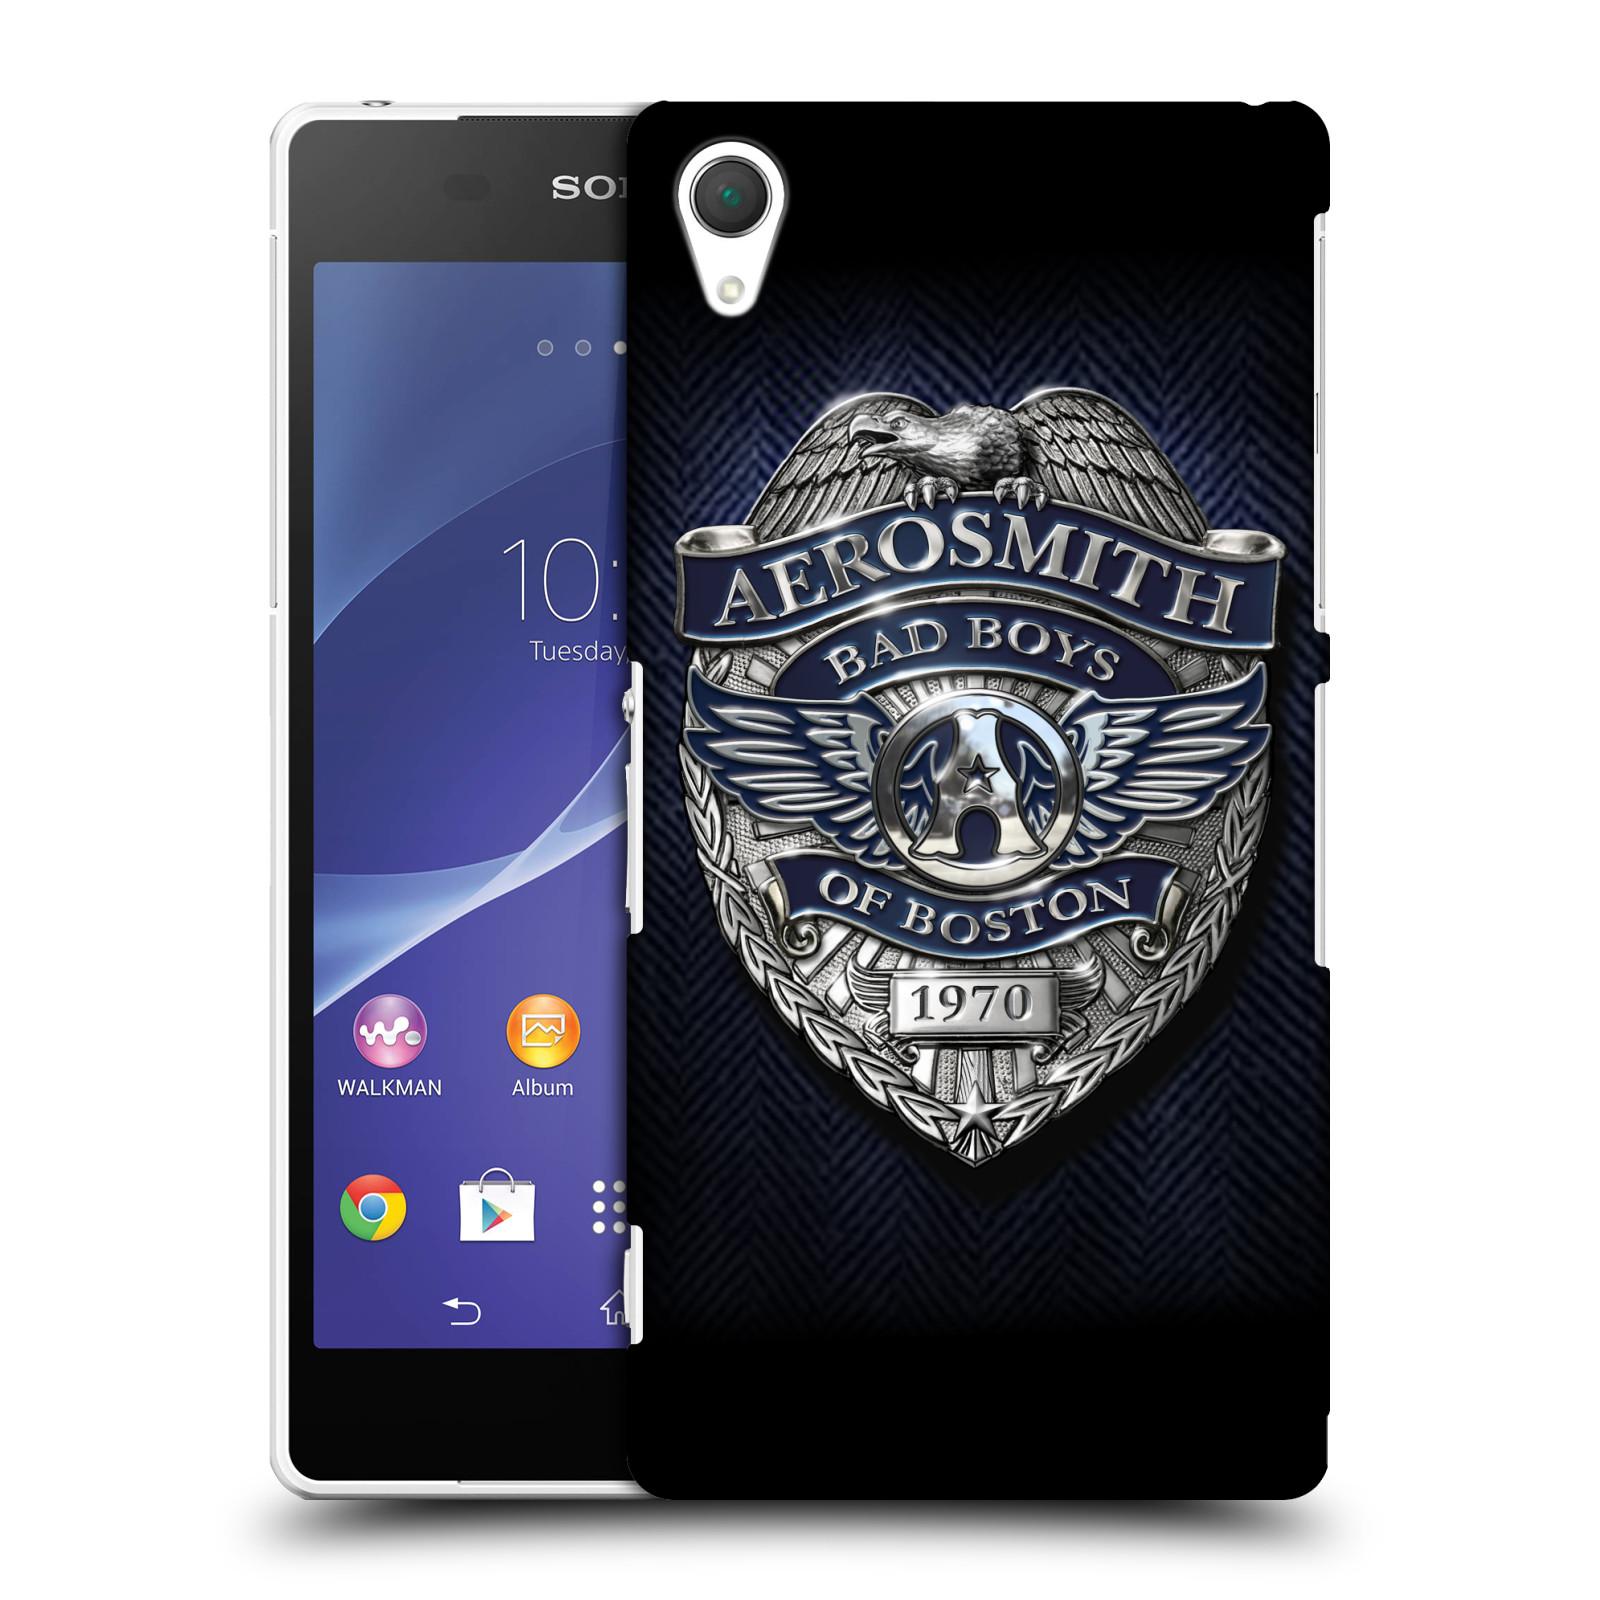 Plastové pouzdro na mobil Sony Xperia Z2 D6503 HEAD CASE - Aerosmith - Bad Boys of Boston